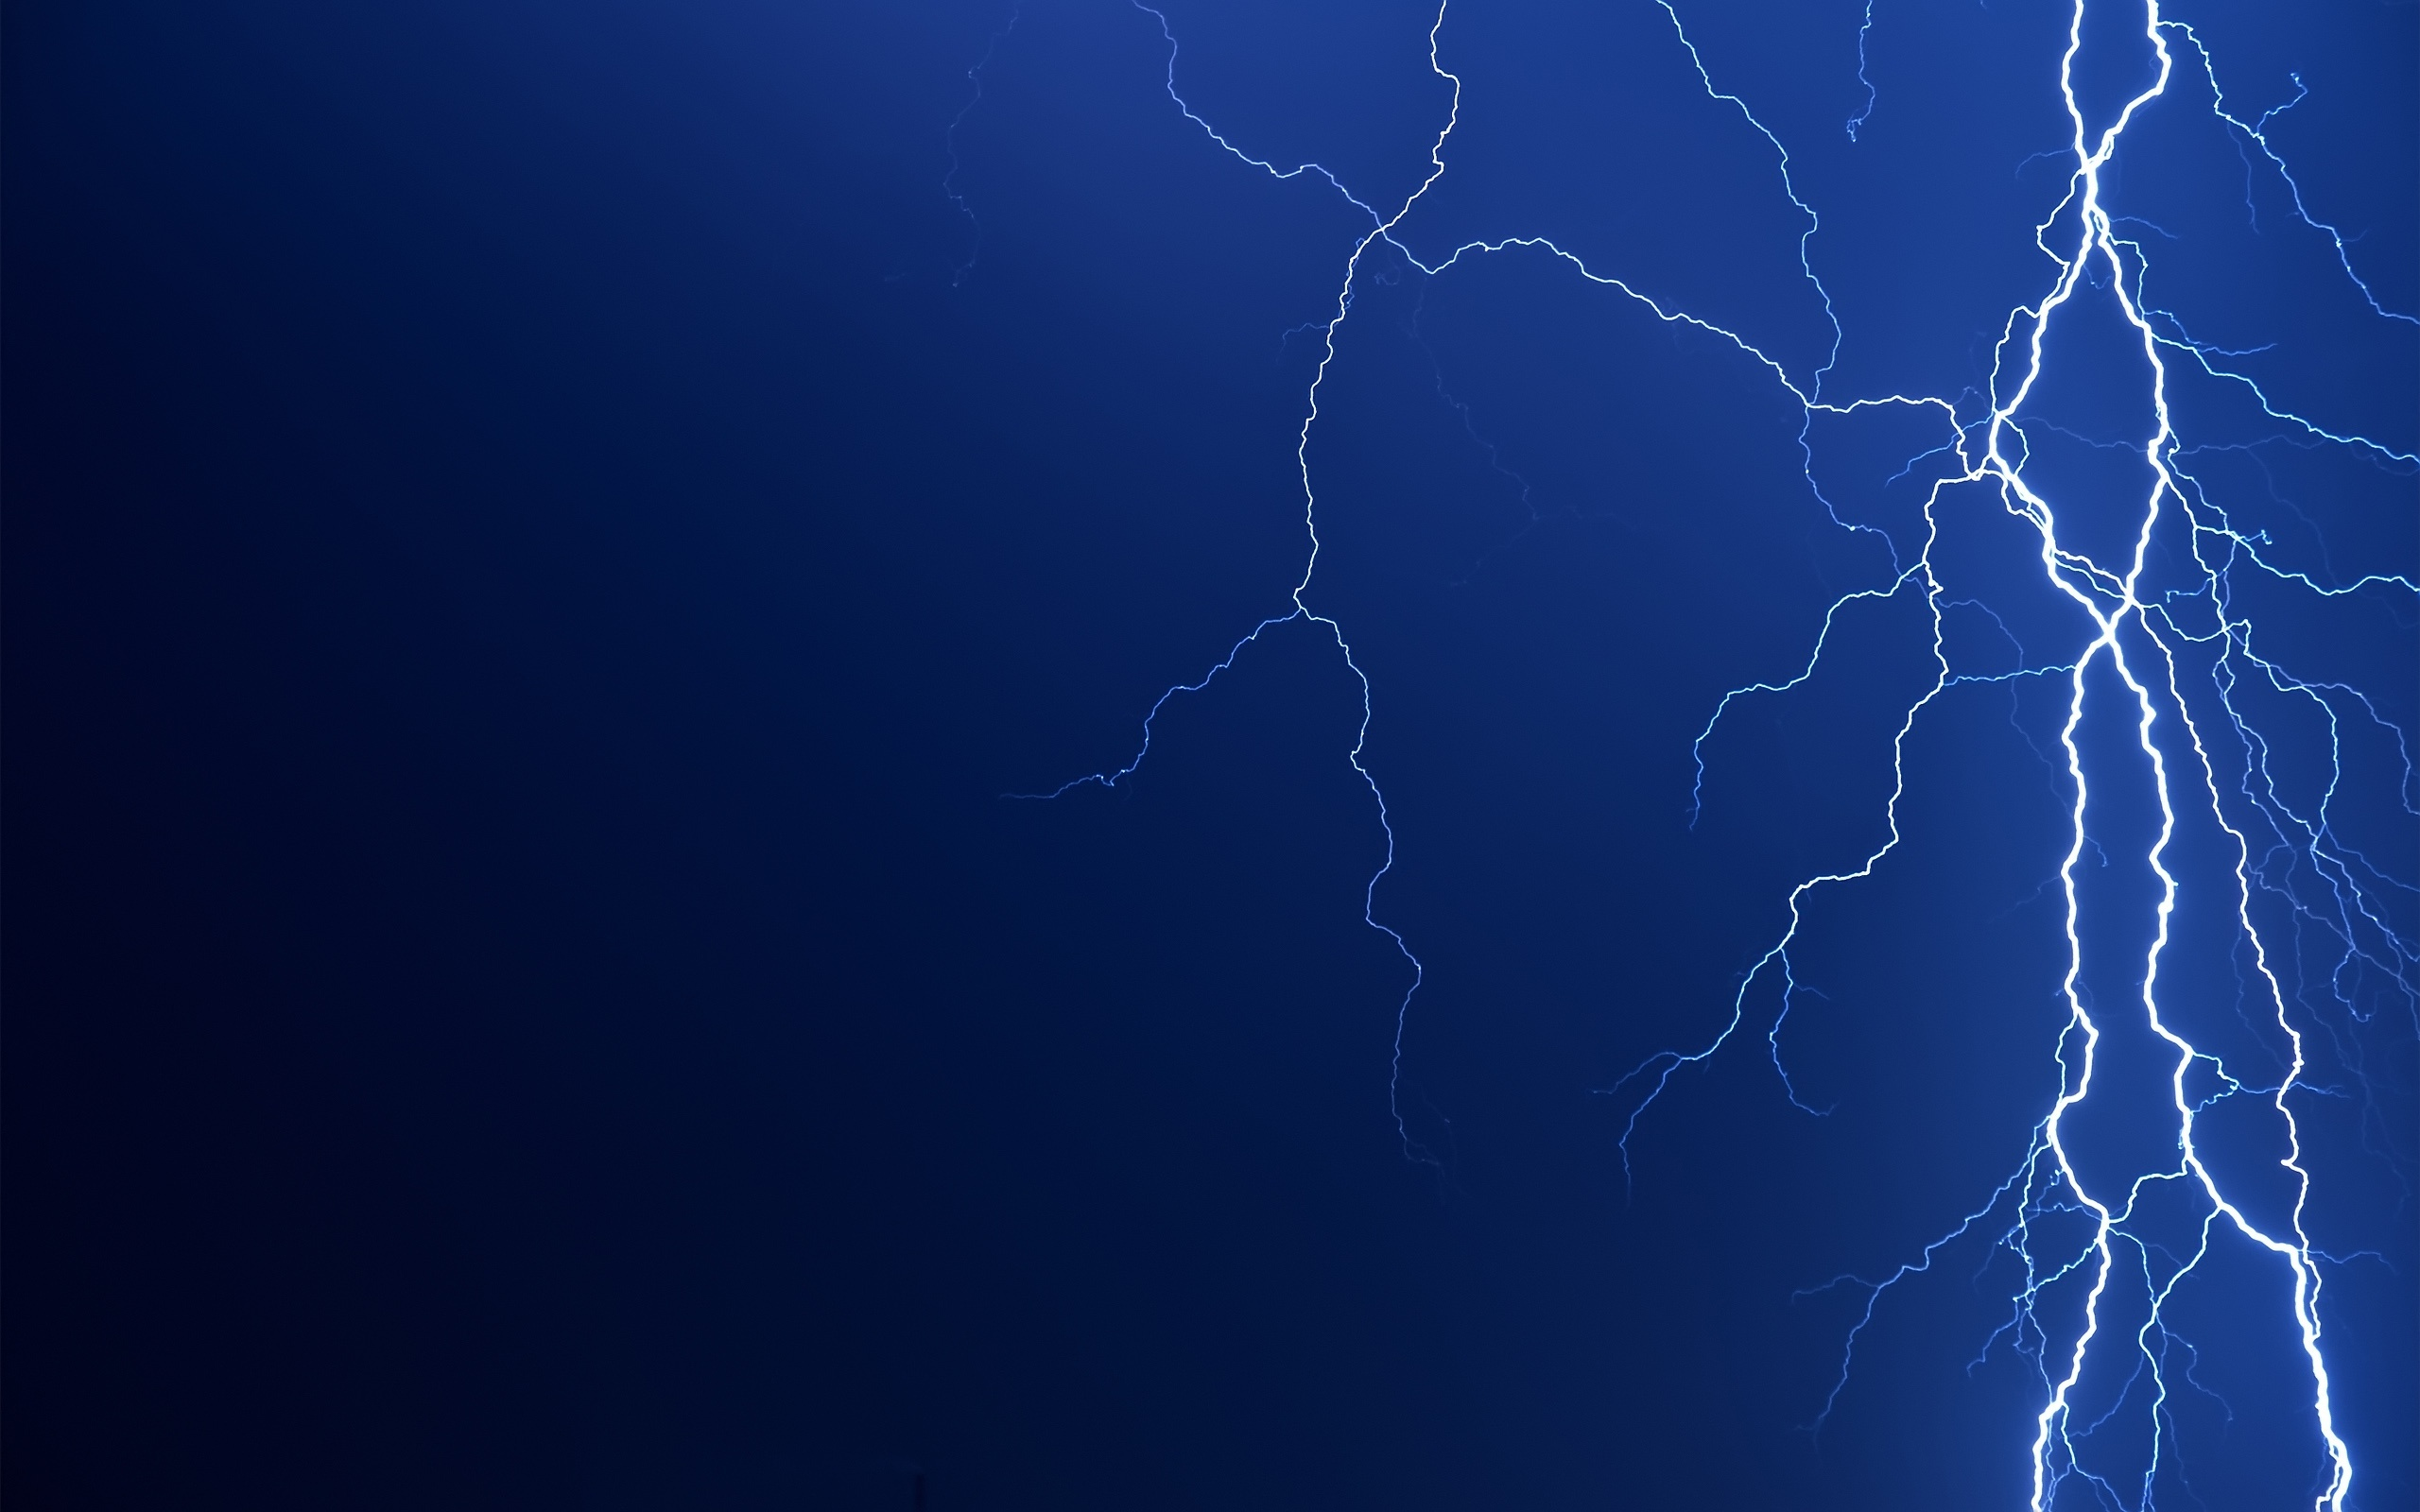 47 Blue Lightning Wallpaper On Wallpapersafari